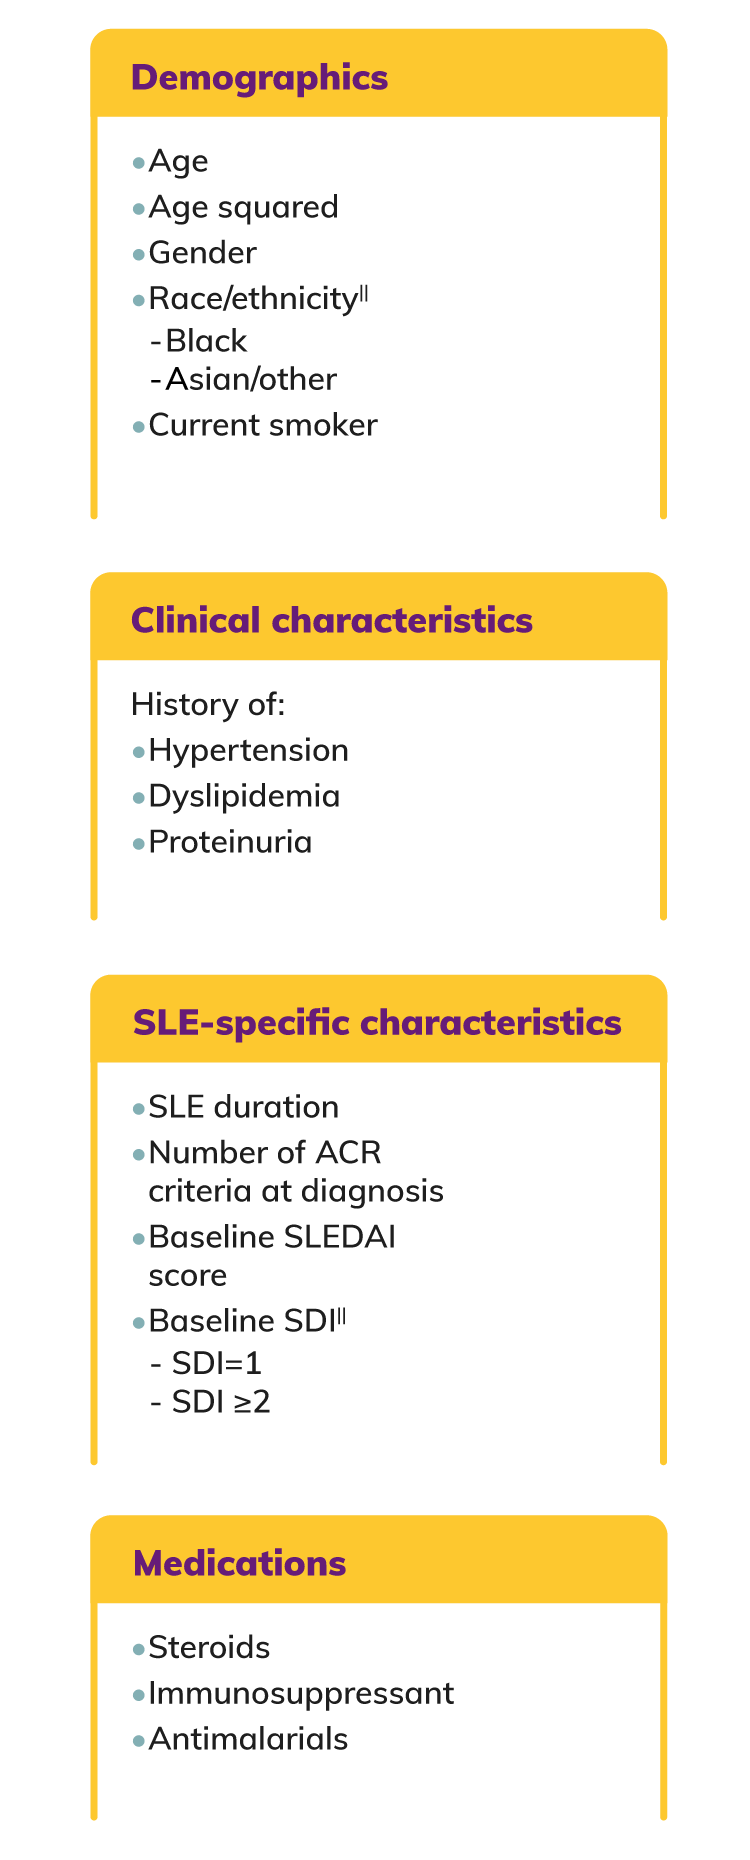 BLISS Baseline Characteristics